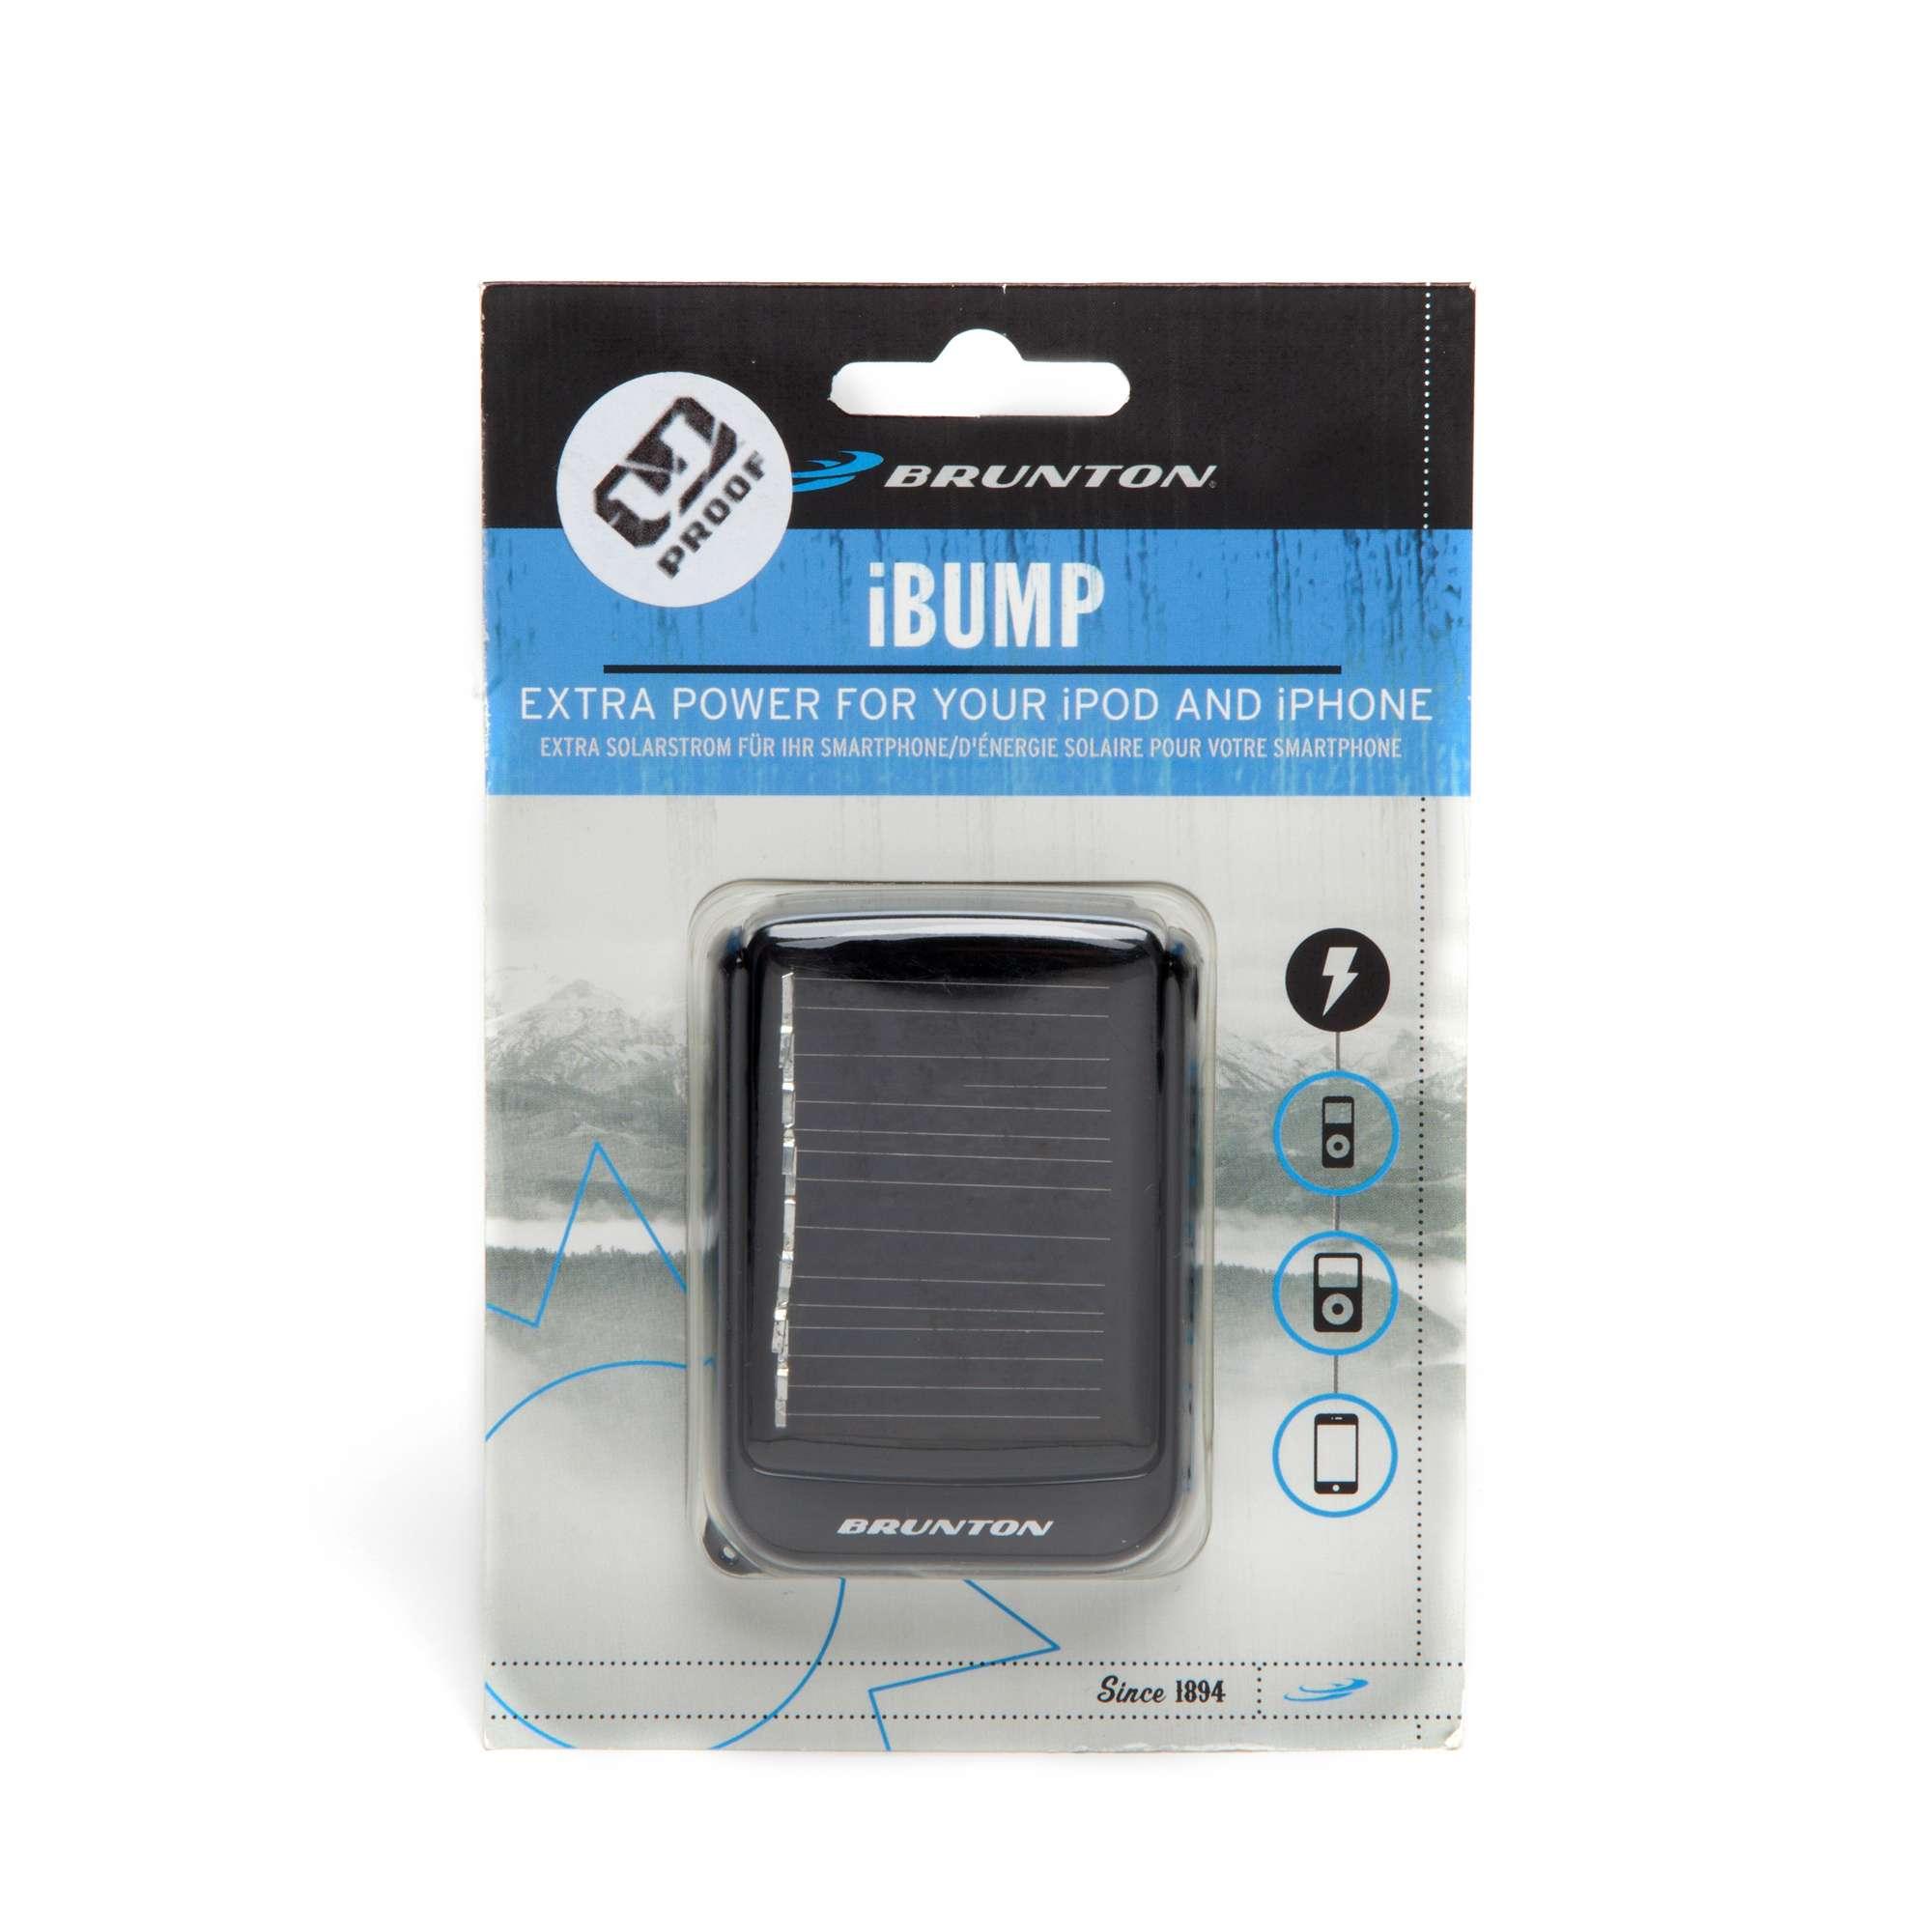 BRUNTON iBump iPhone/iPod Solar Charger